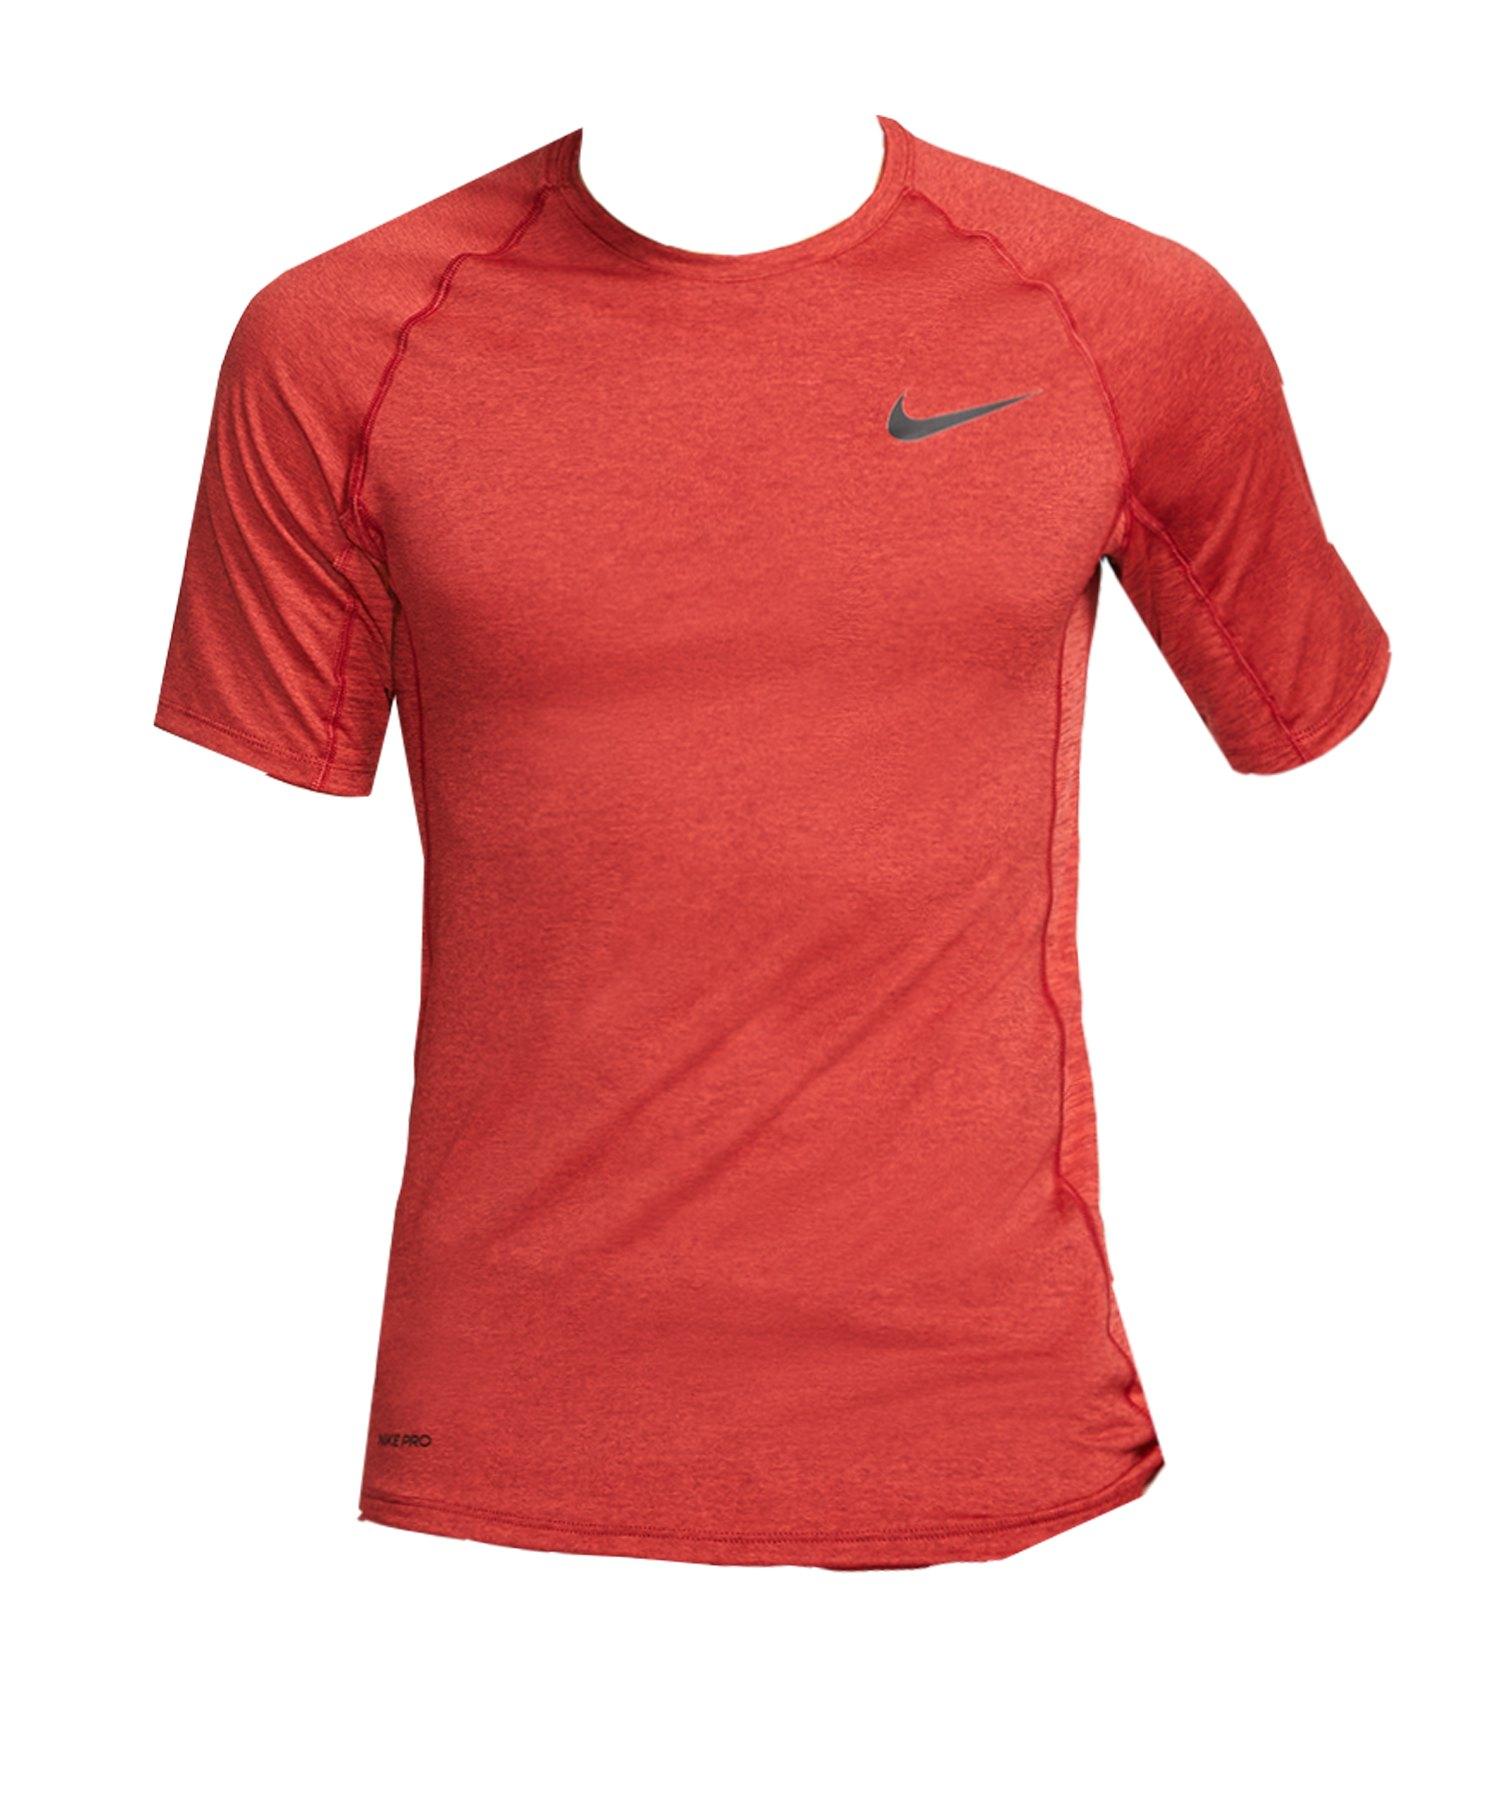 Nike Pro Compression Shortsleeve Shirt Rot F681 - rot